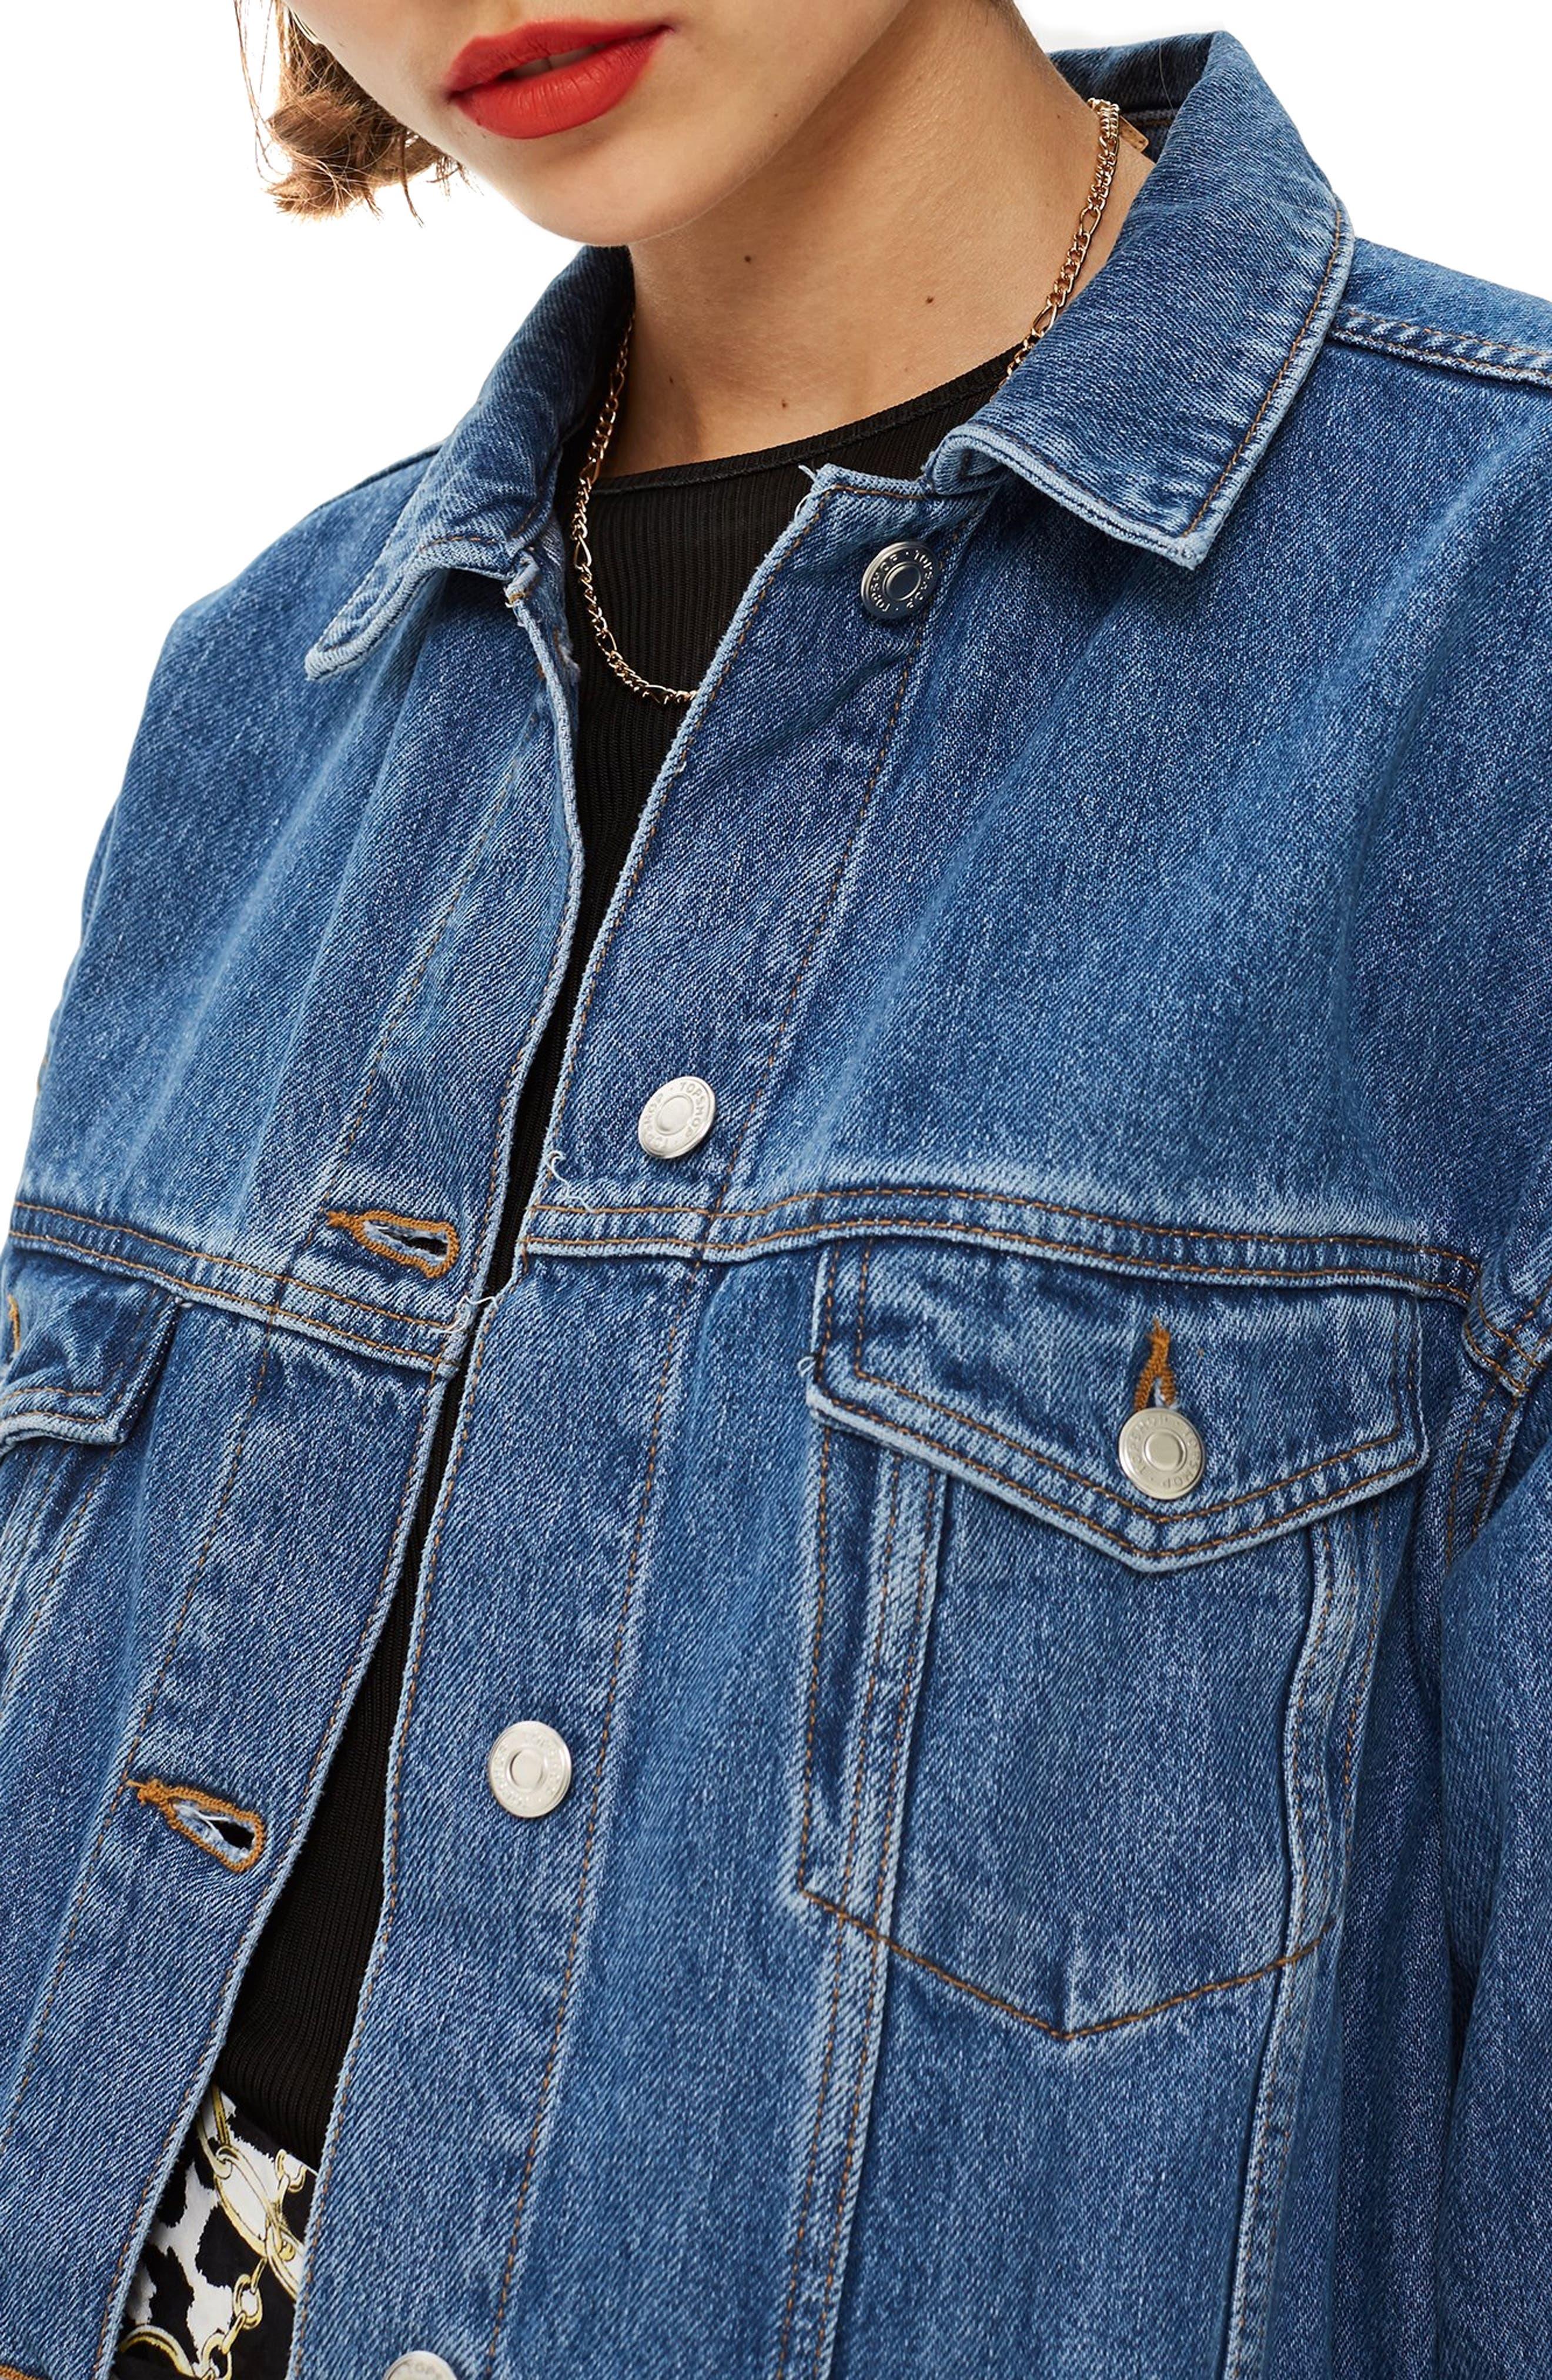 TOPSHOP, Oversized Denim Jacket, Alternate thumbnail 4, color, MID DENIM